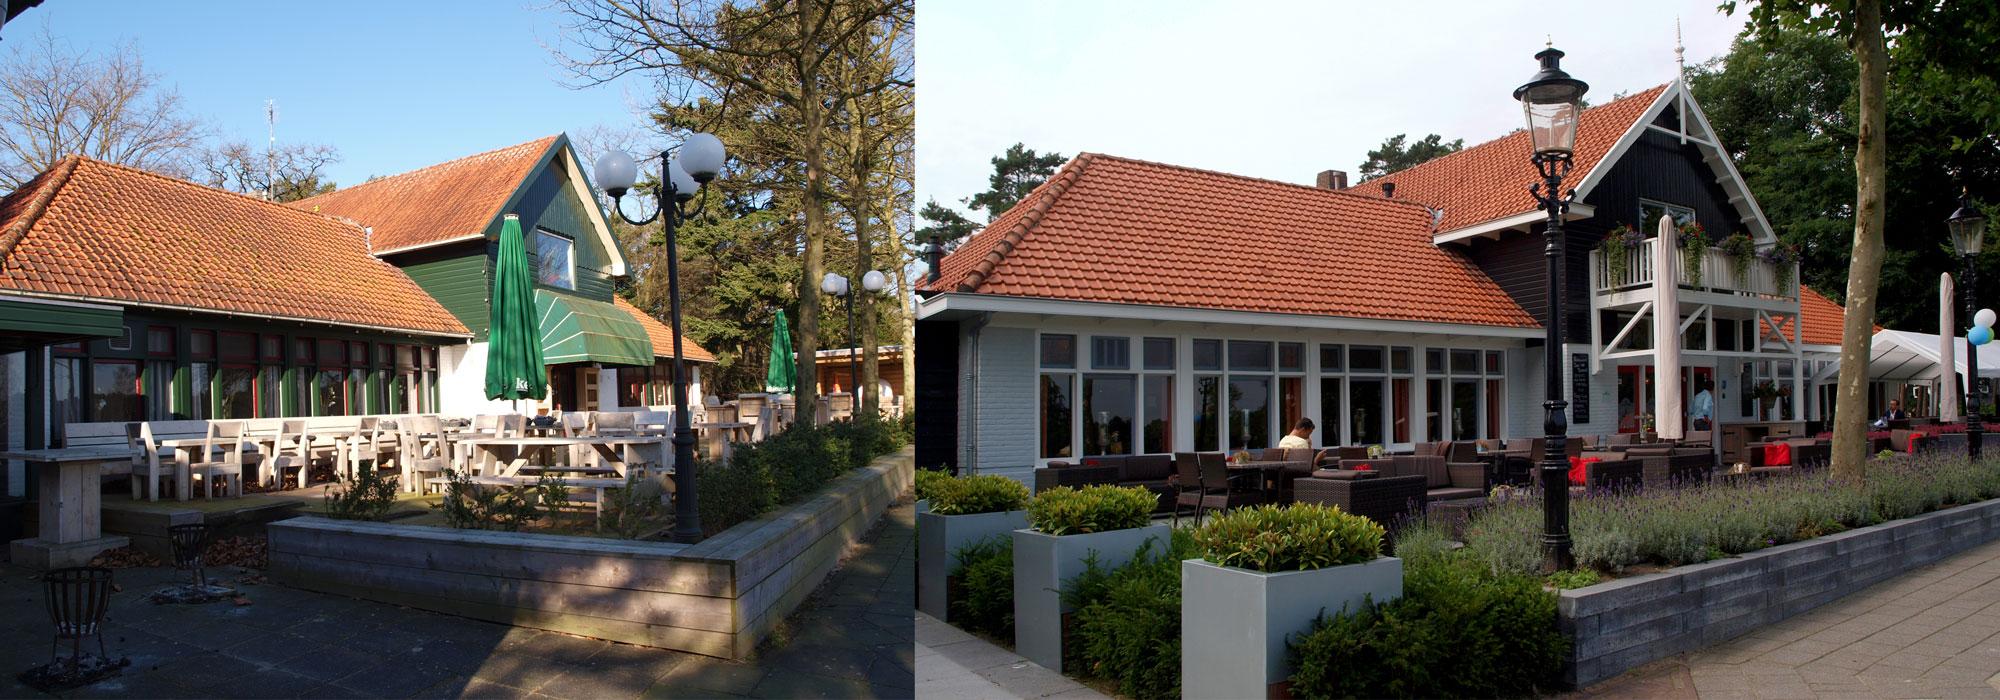 Restaurant en terras vóór en na de verbouwing